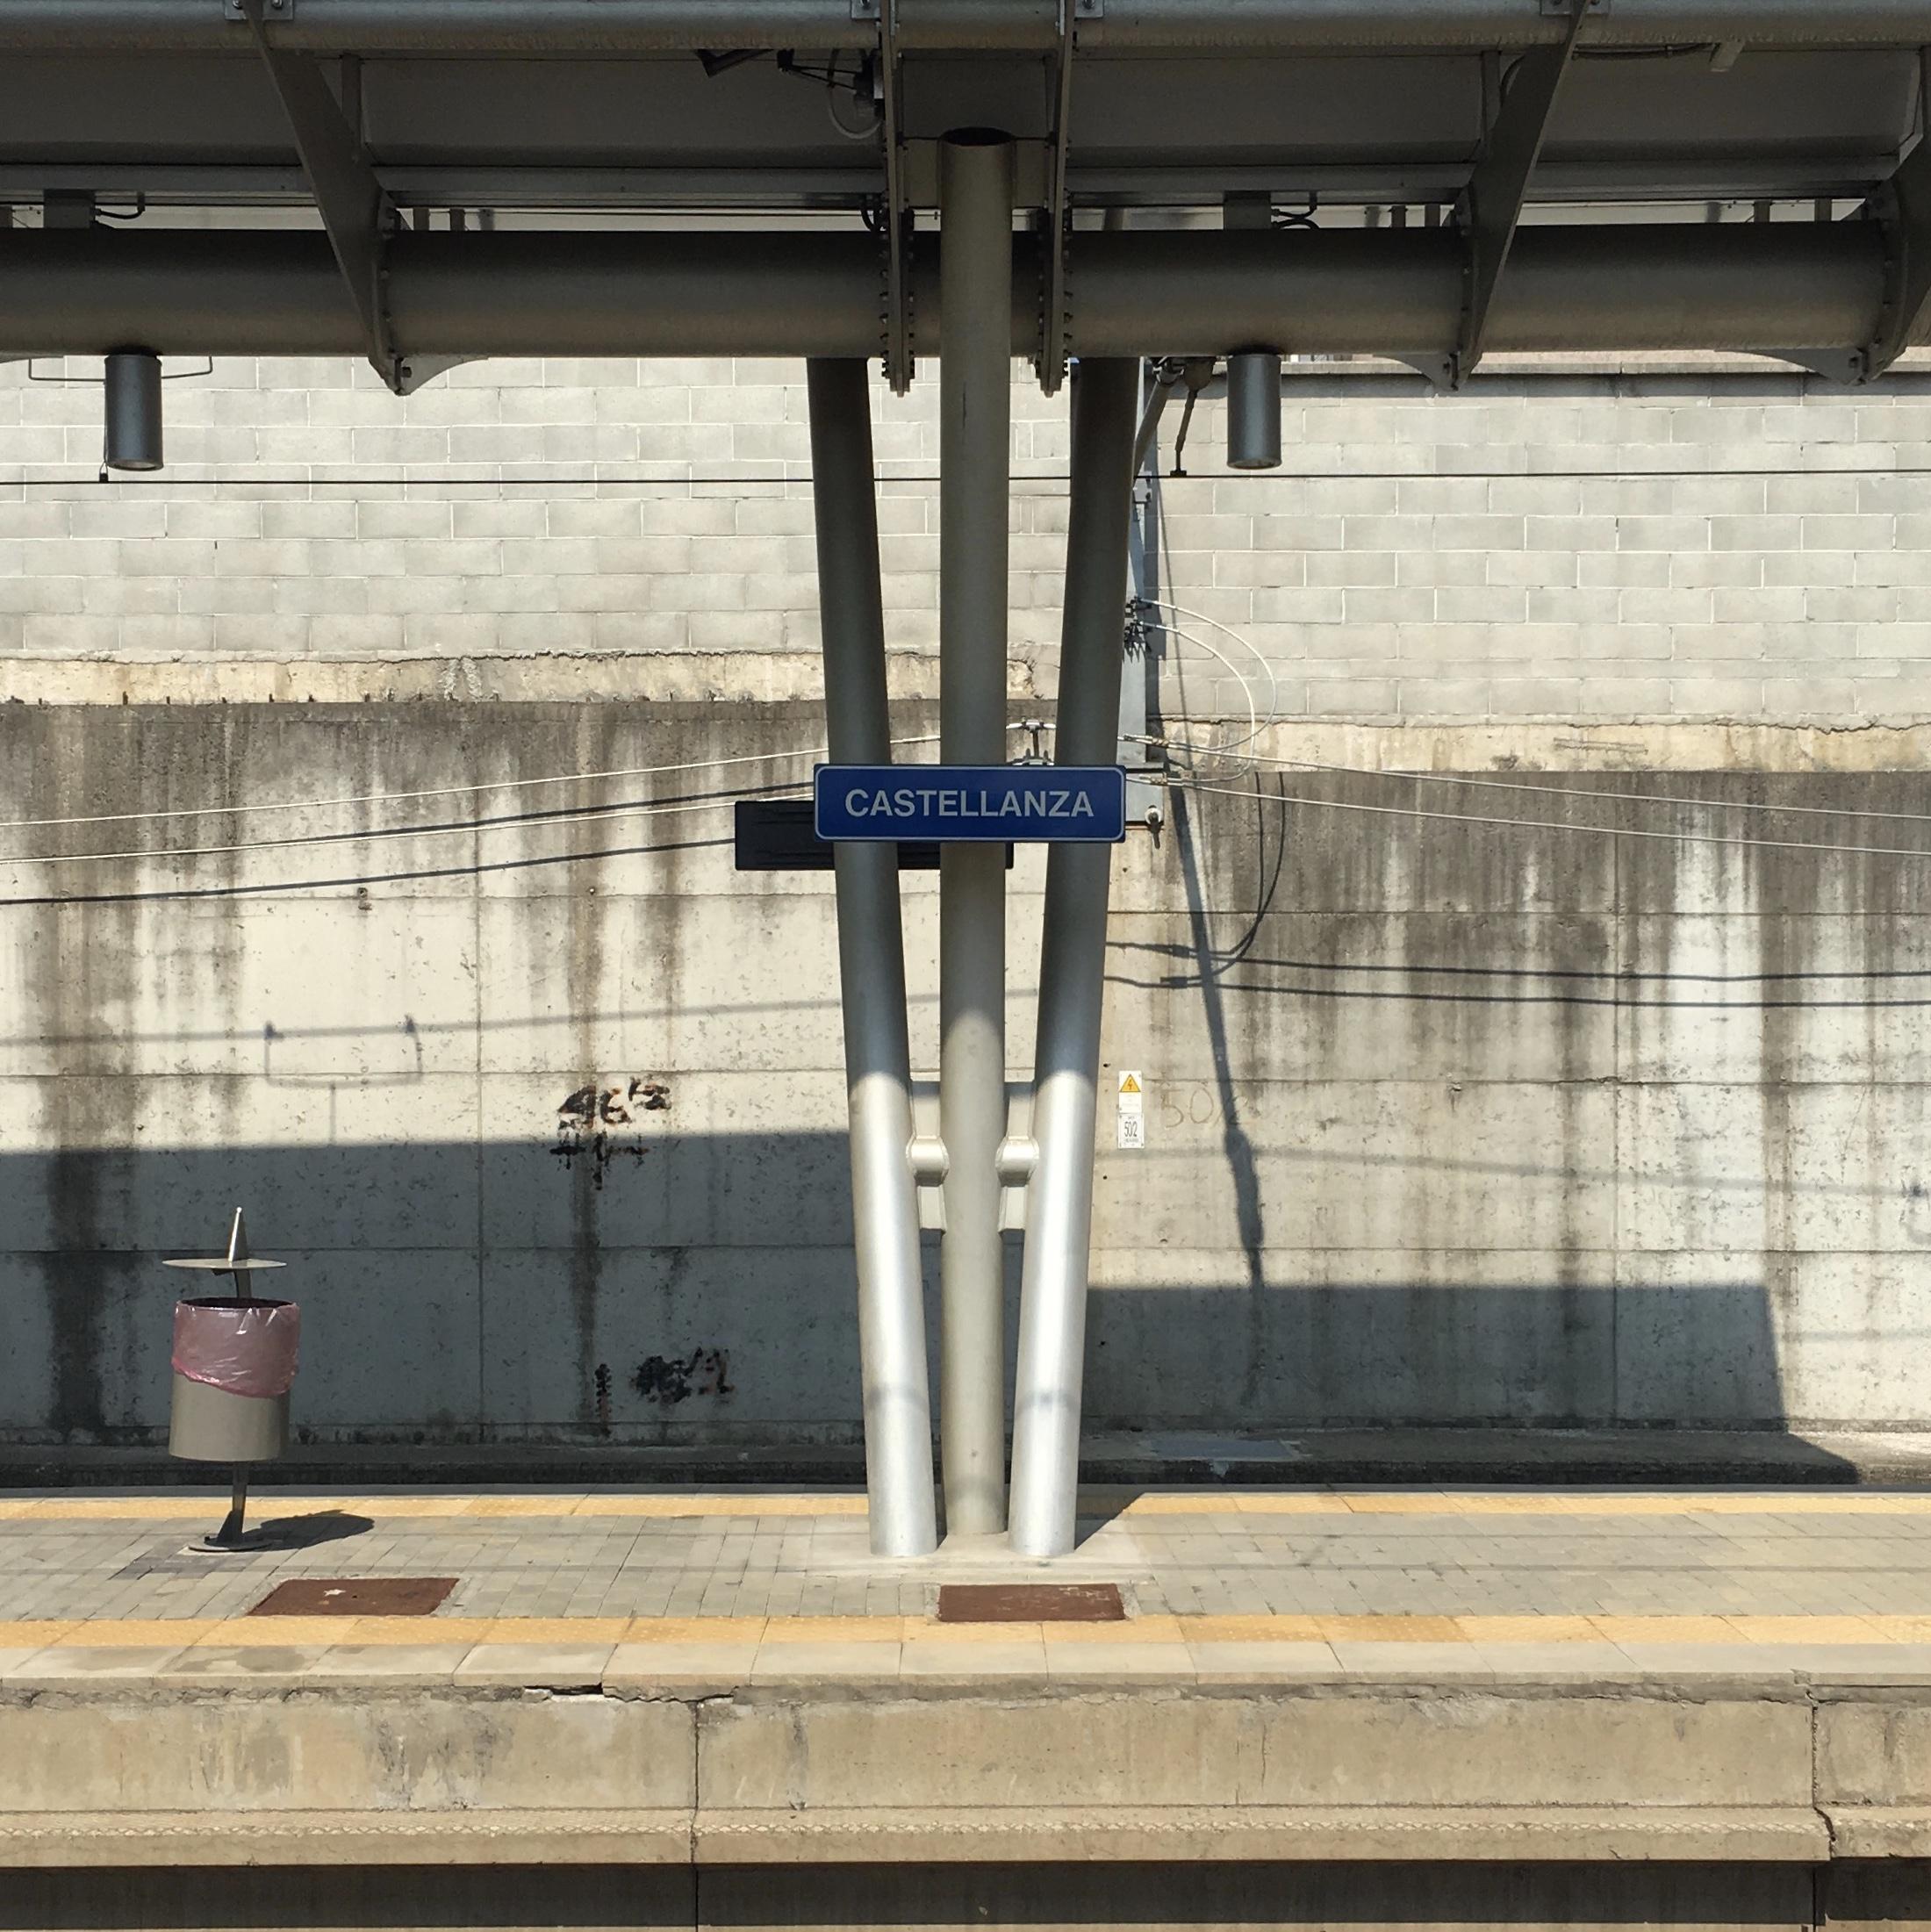 Samantha McNeil Blog Castellanza Train Station